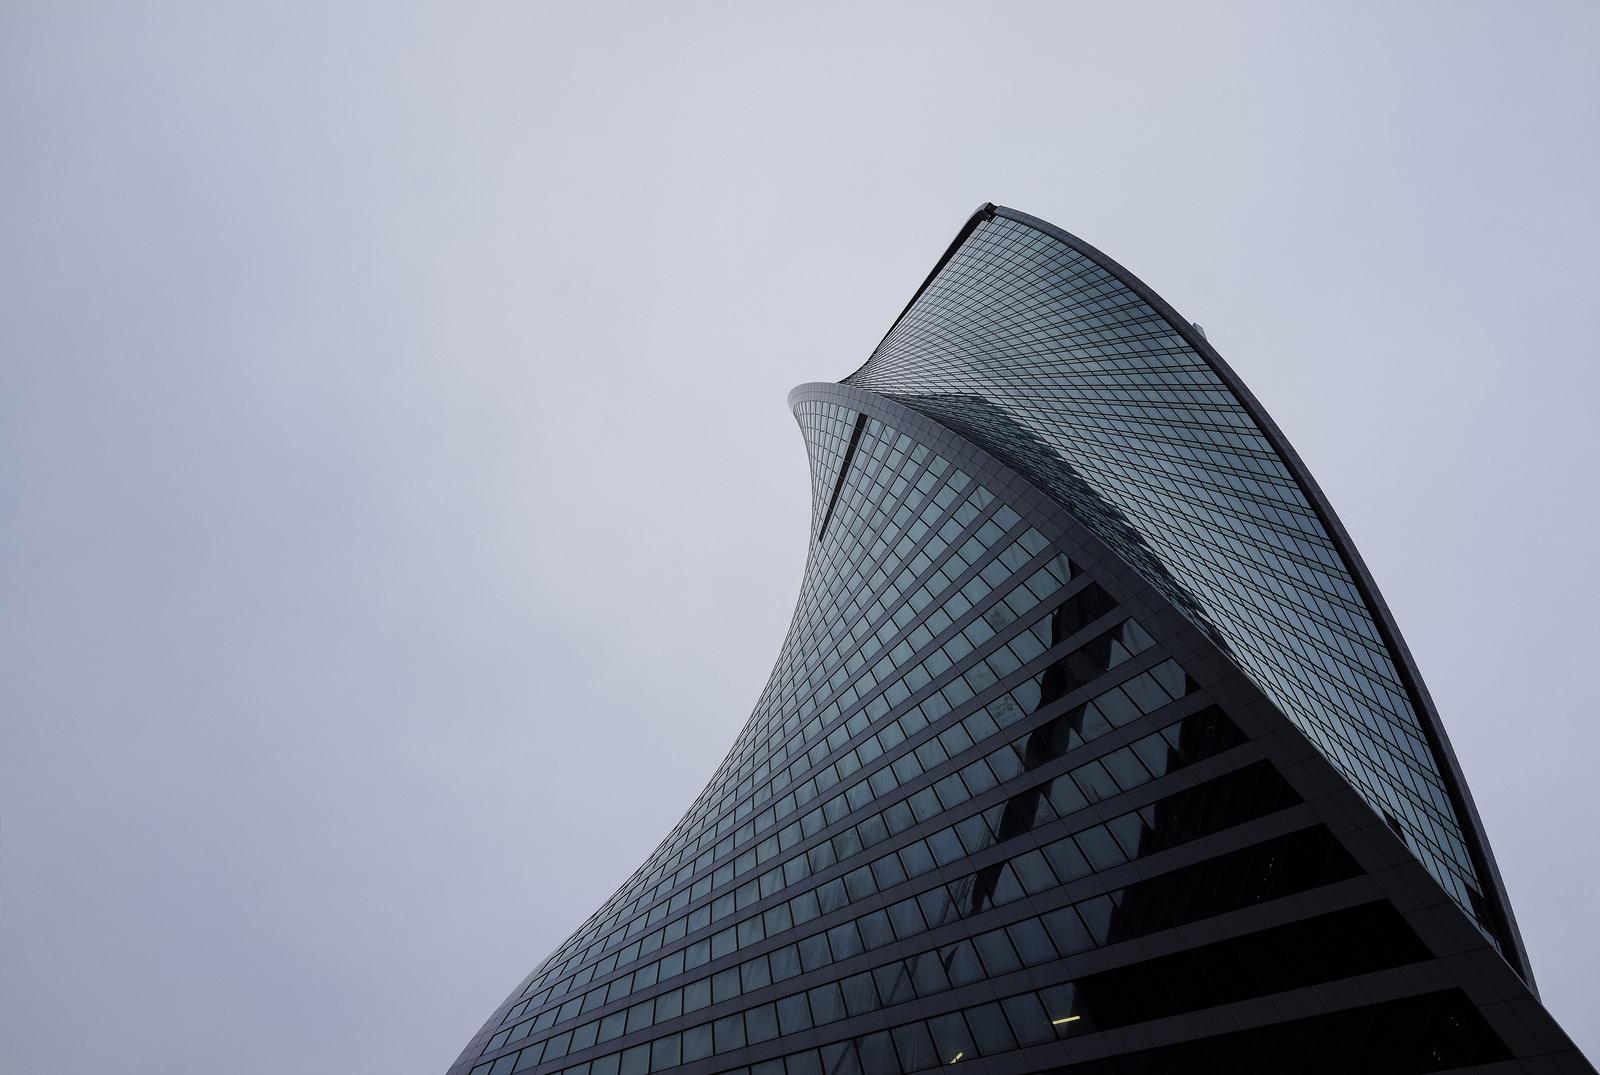 Evolution Tower Wins Second Place at Emporis Skyscraper Awards